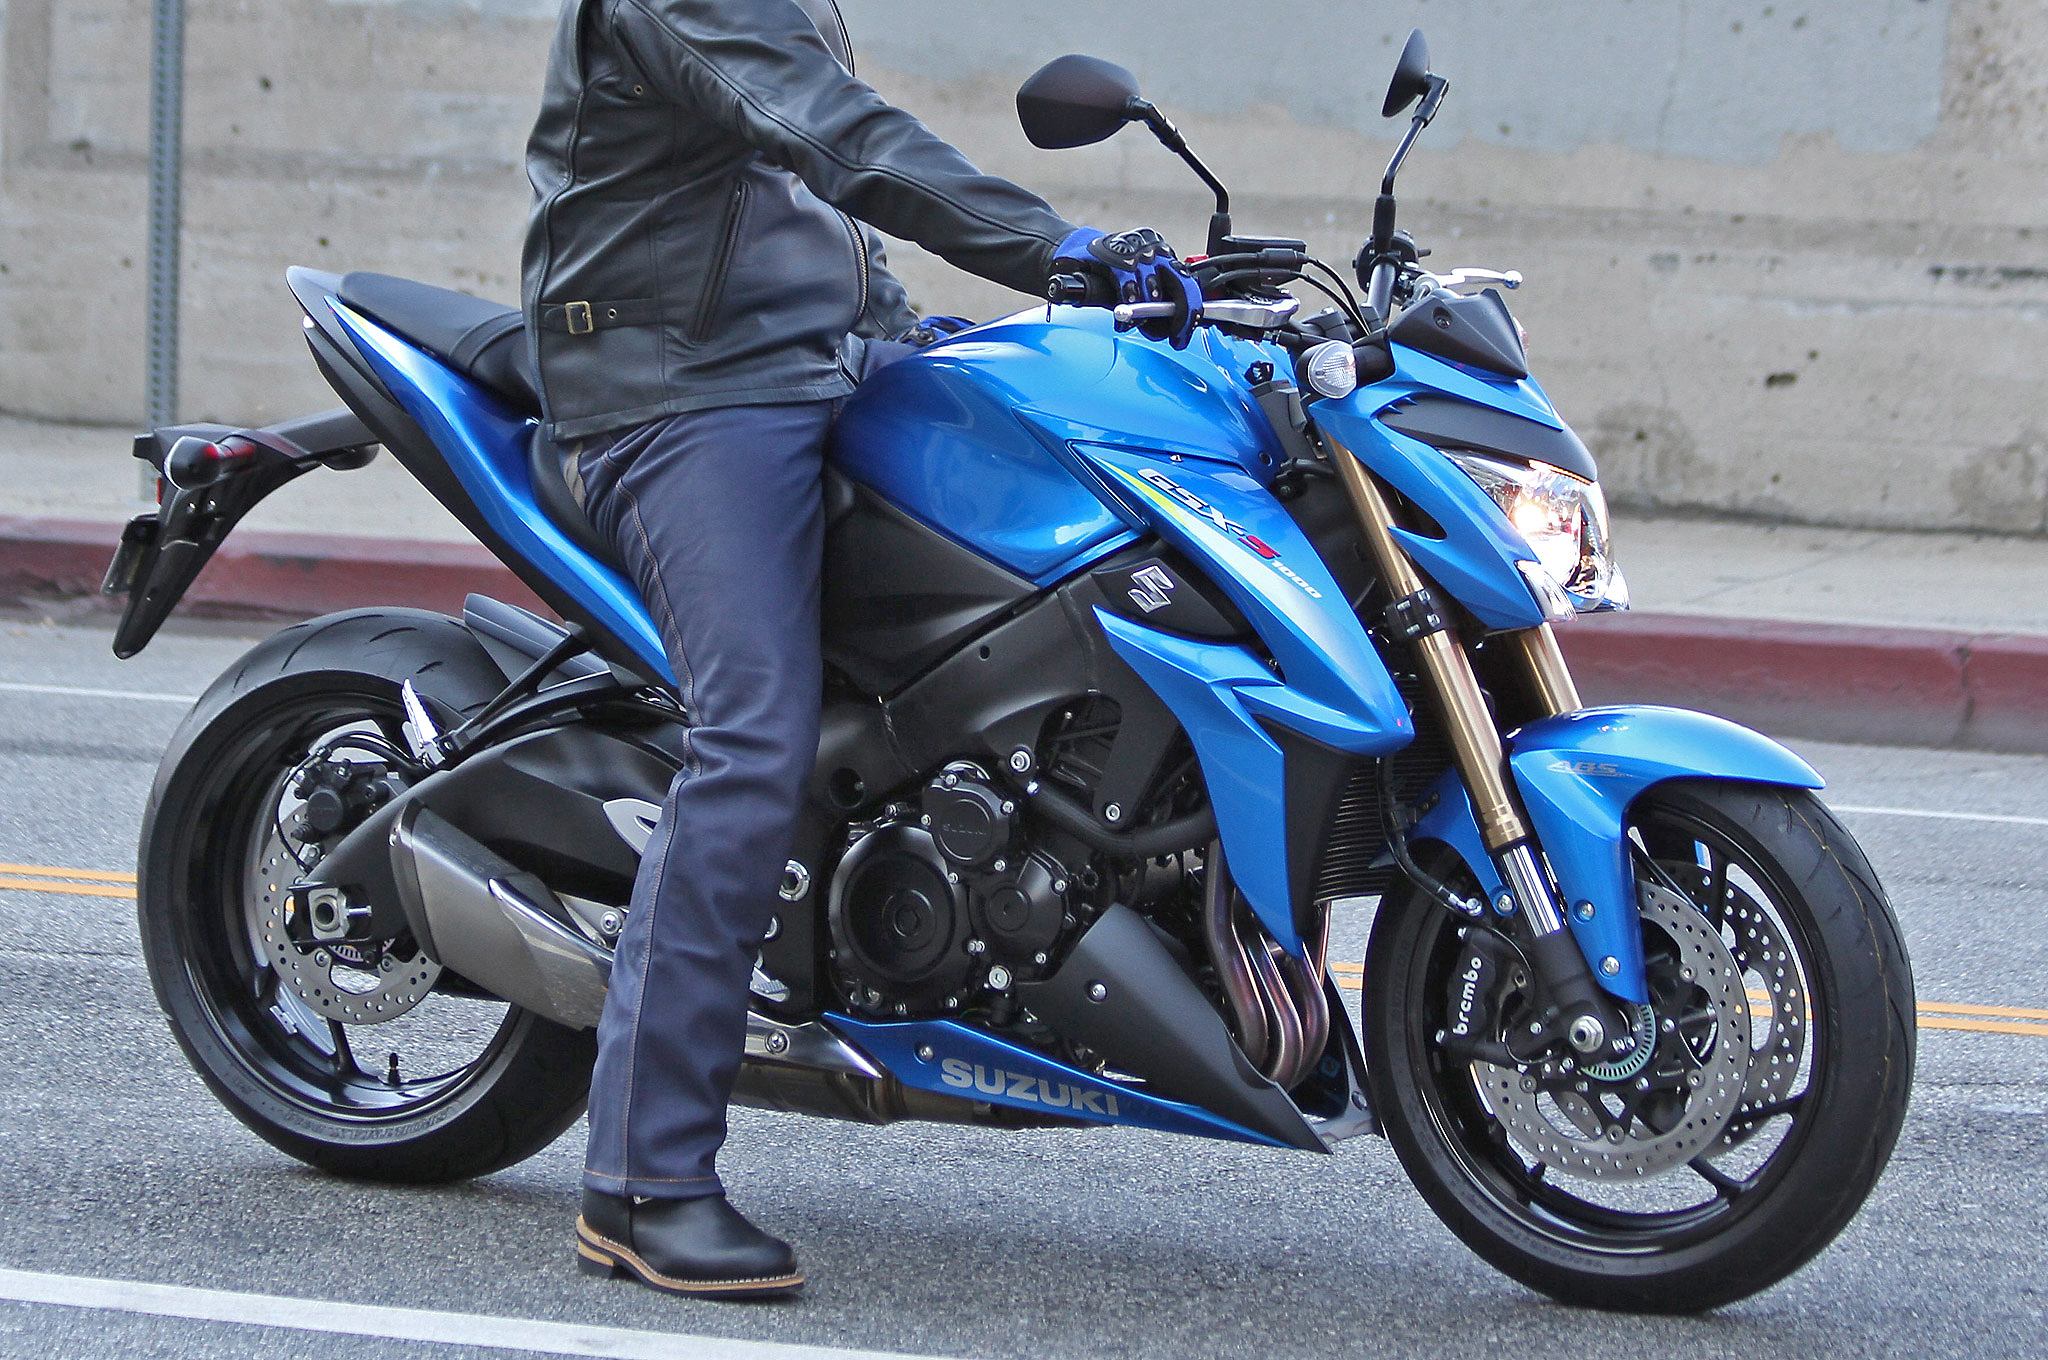 2015 Suzuki GSX-S1000 High-Resolution Pics Show Bike Ready to Roll